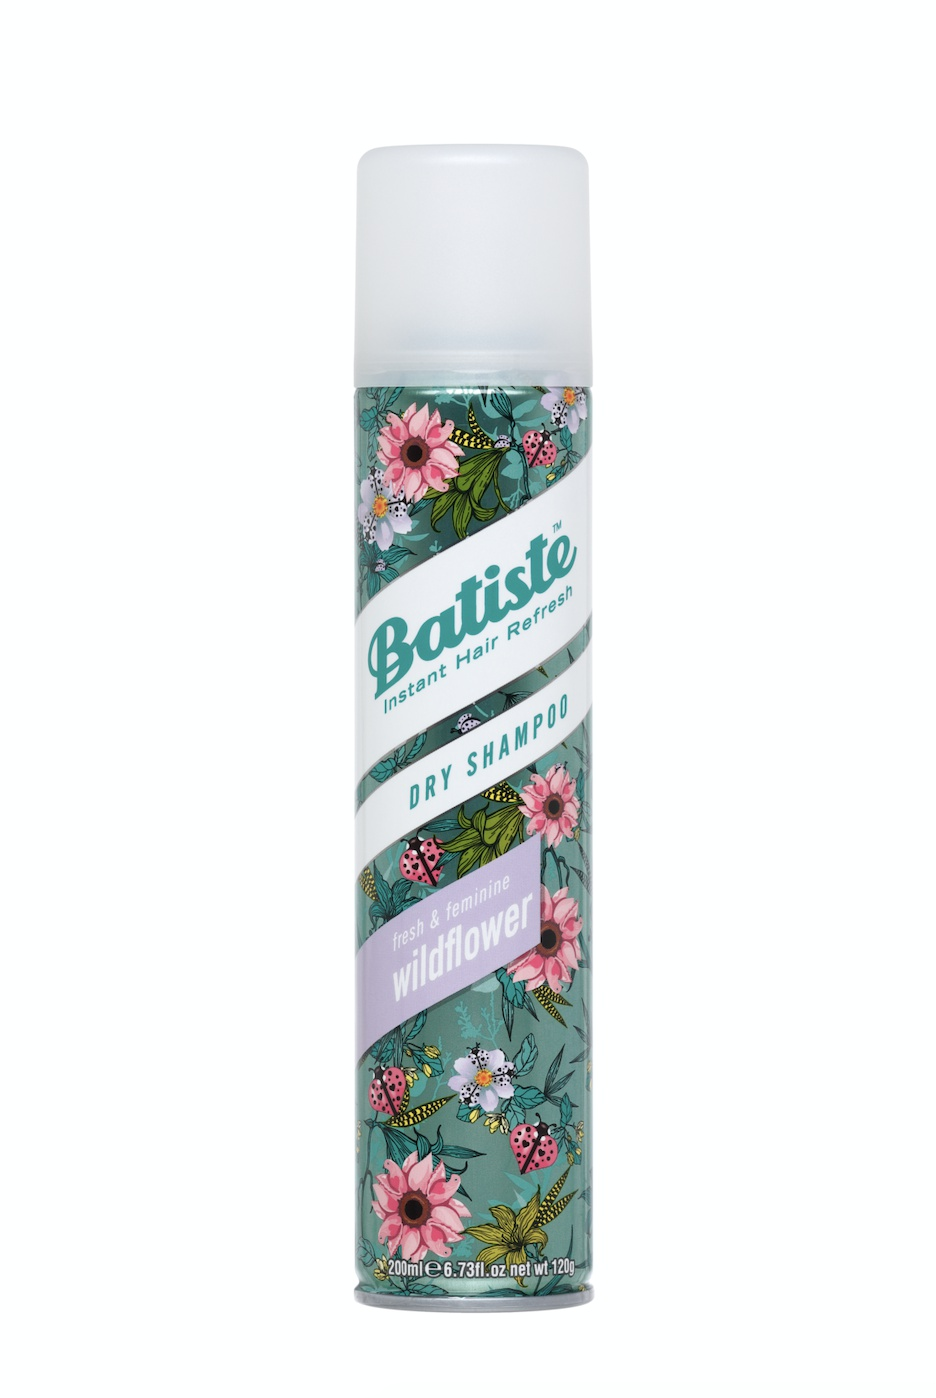 Batiste Dry Shampoo - Wildflower